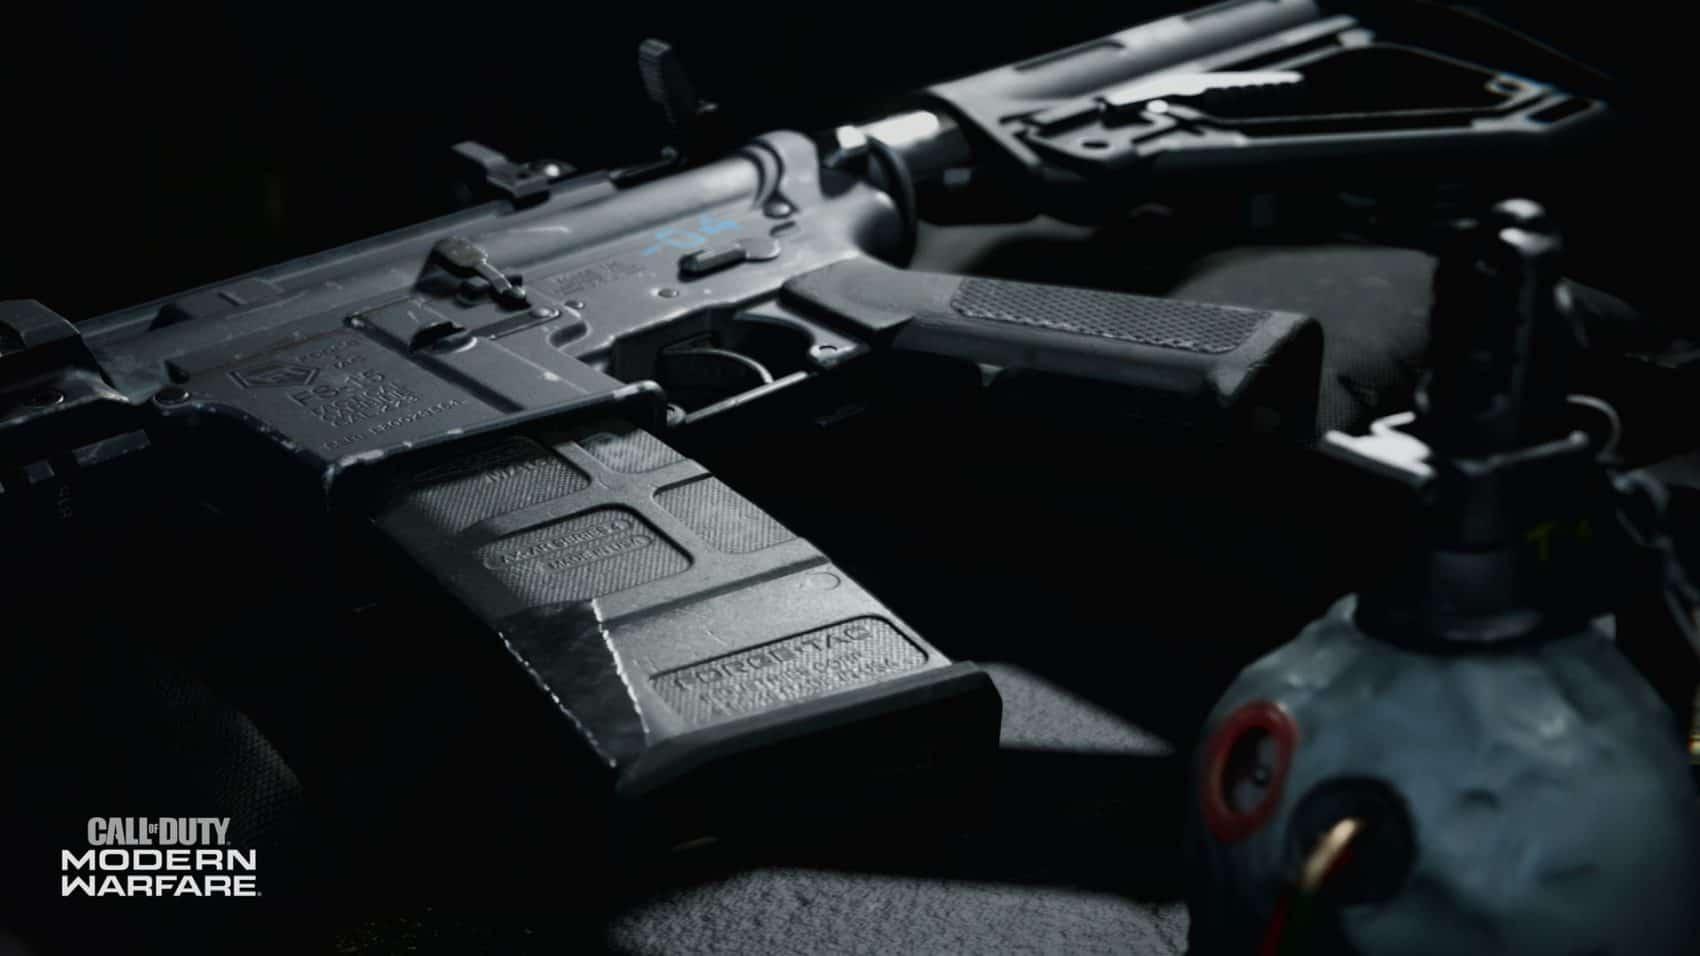 Call of Duty : Modern Warfare configuration recommandée